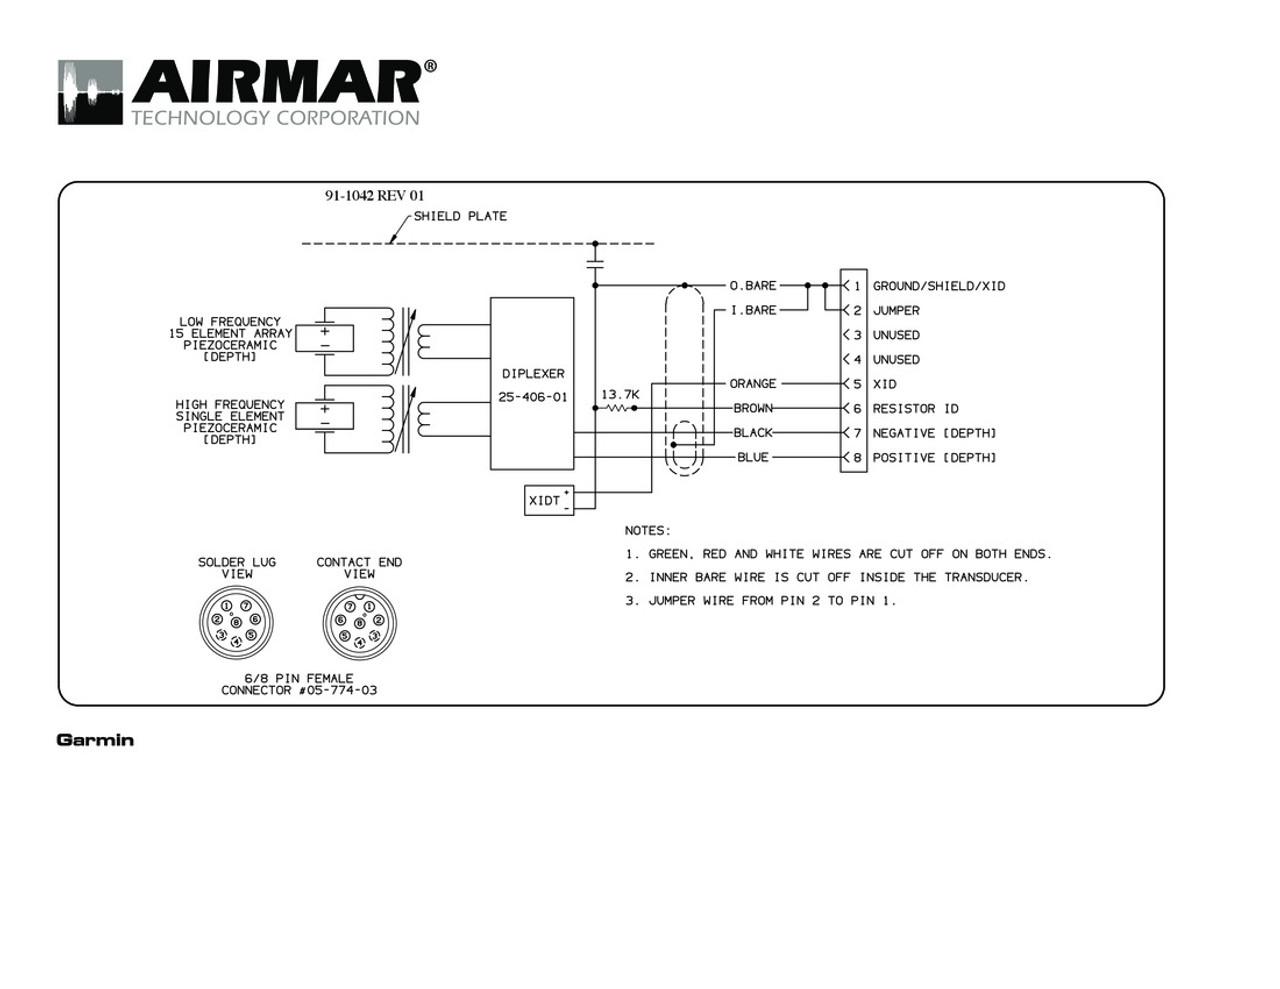 small resolution of 441s garmin wiring diagram wiring diagram centregarmin gps 441s wiring diagram wiring libraryairmar wiring diagram garmin